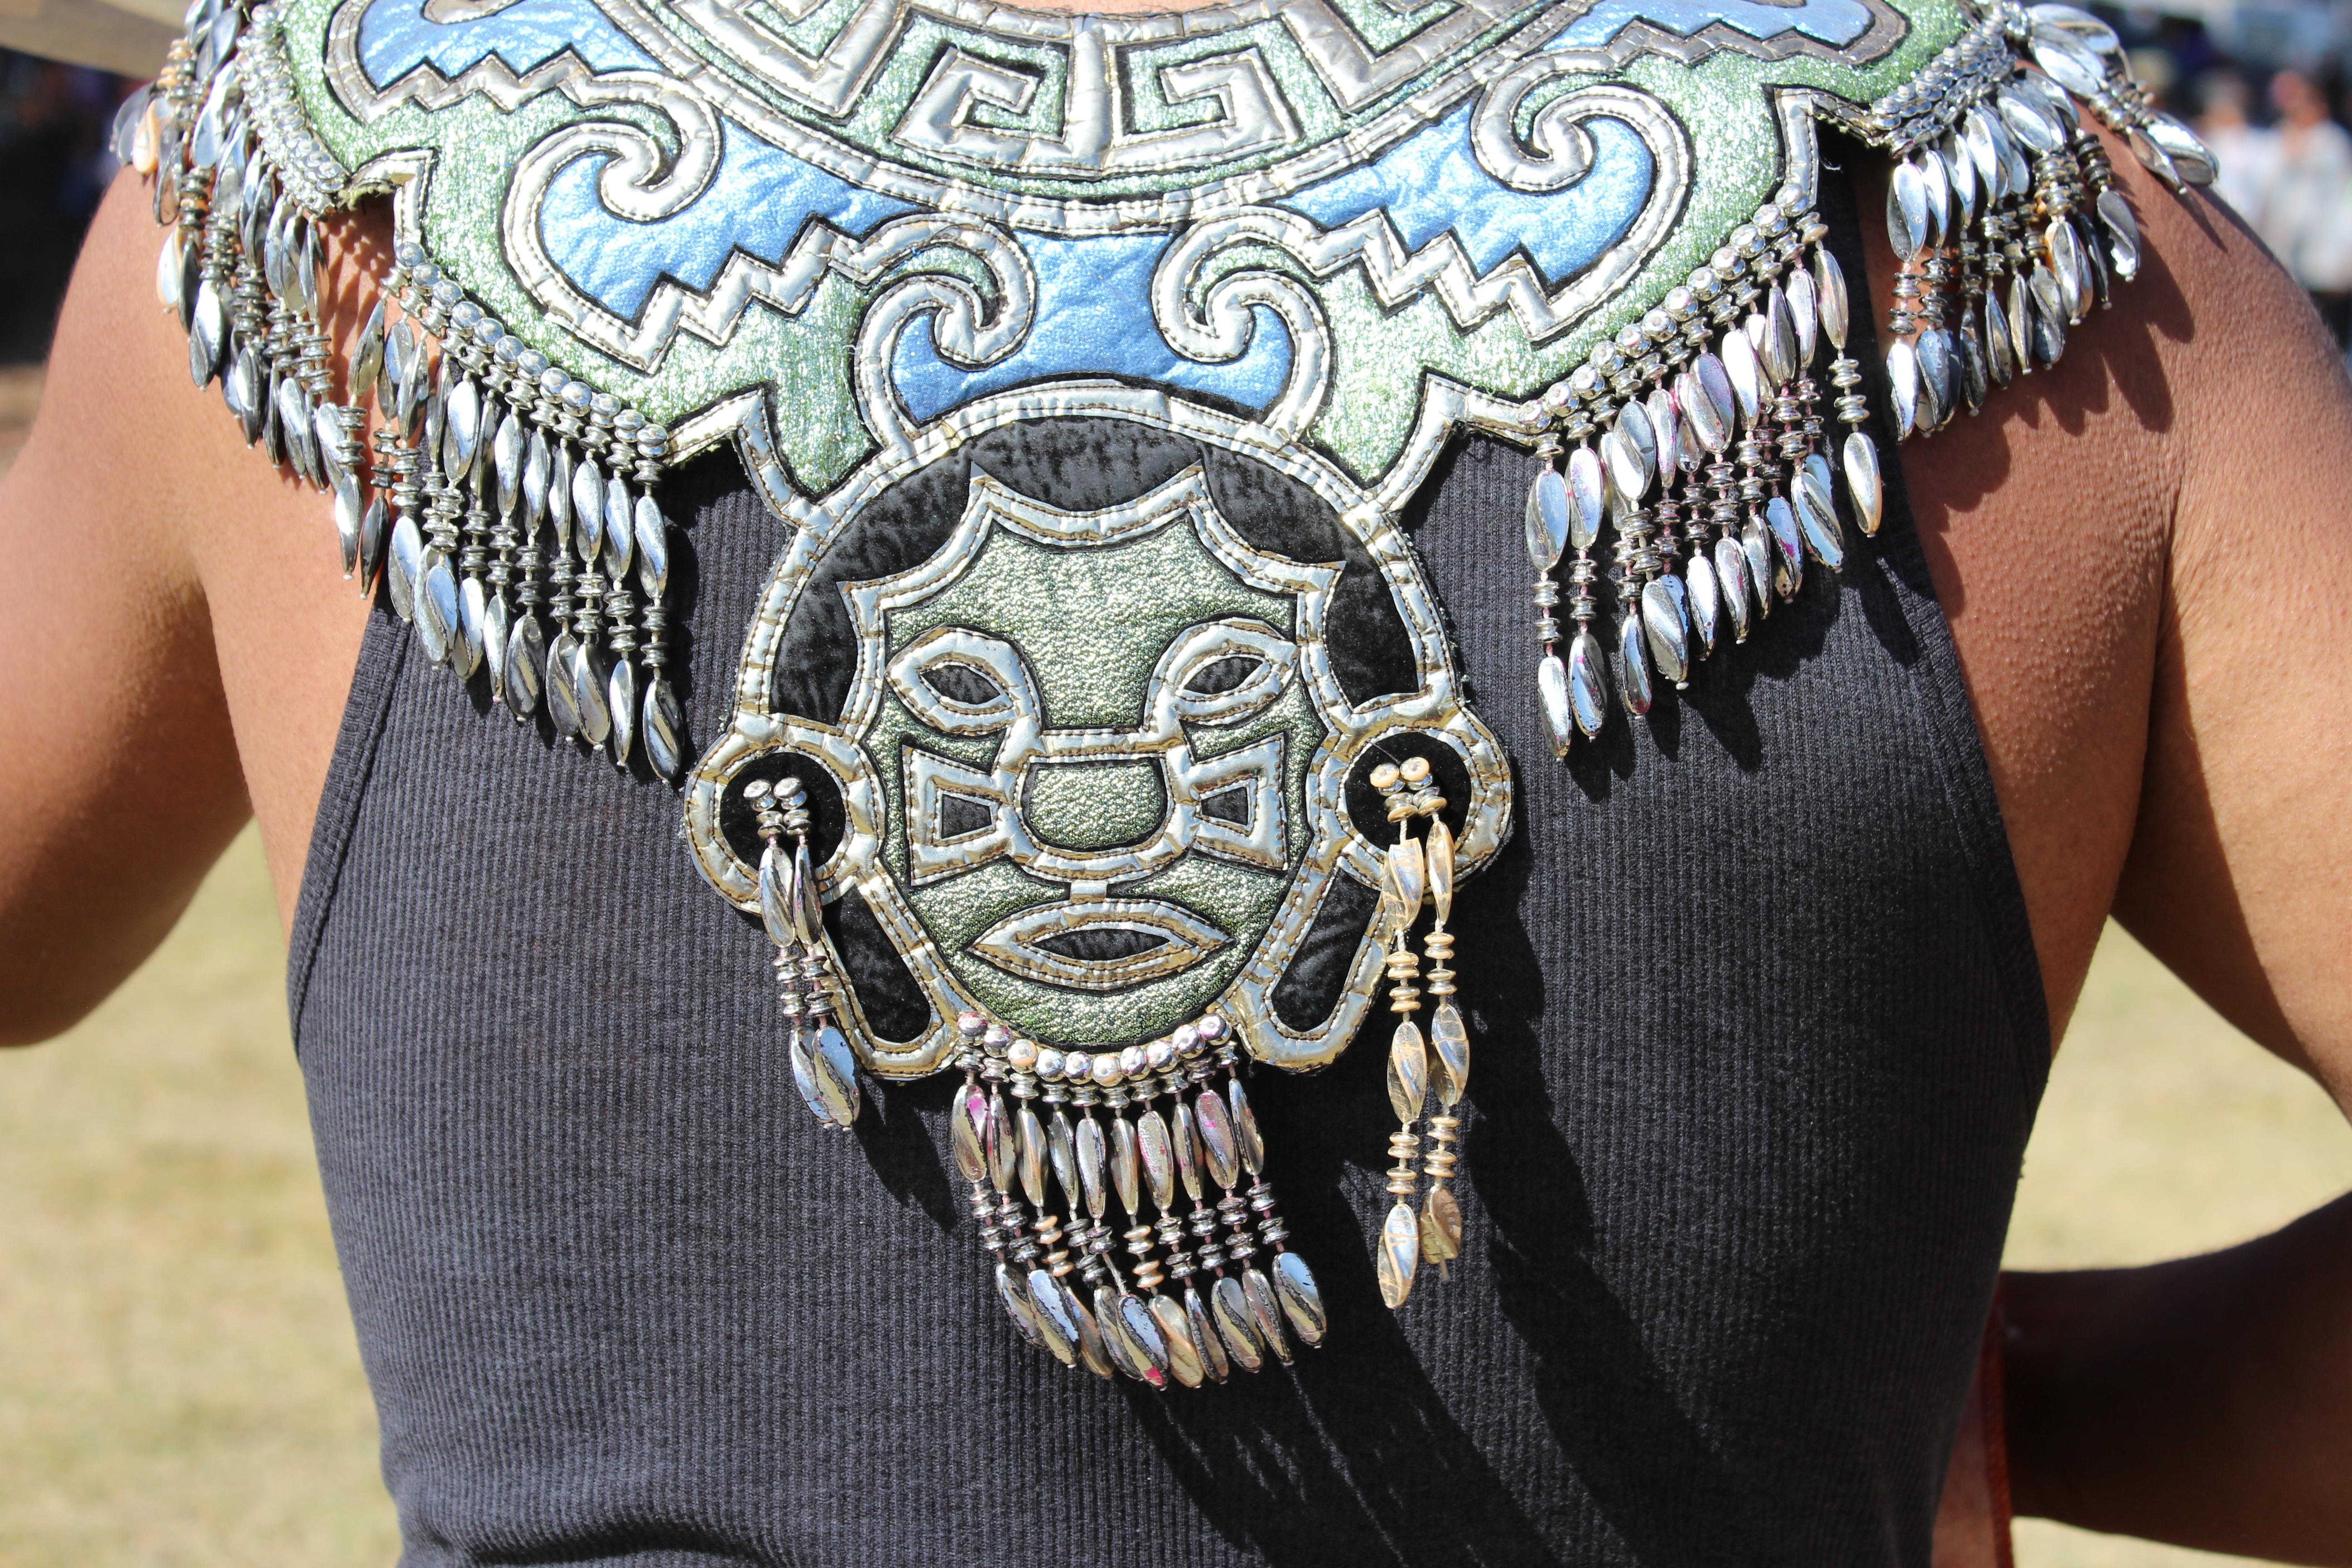 Fotos Gratis Ropa Azteca Art Colores Dibujo Plumas Méjico